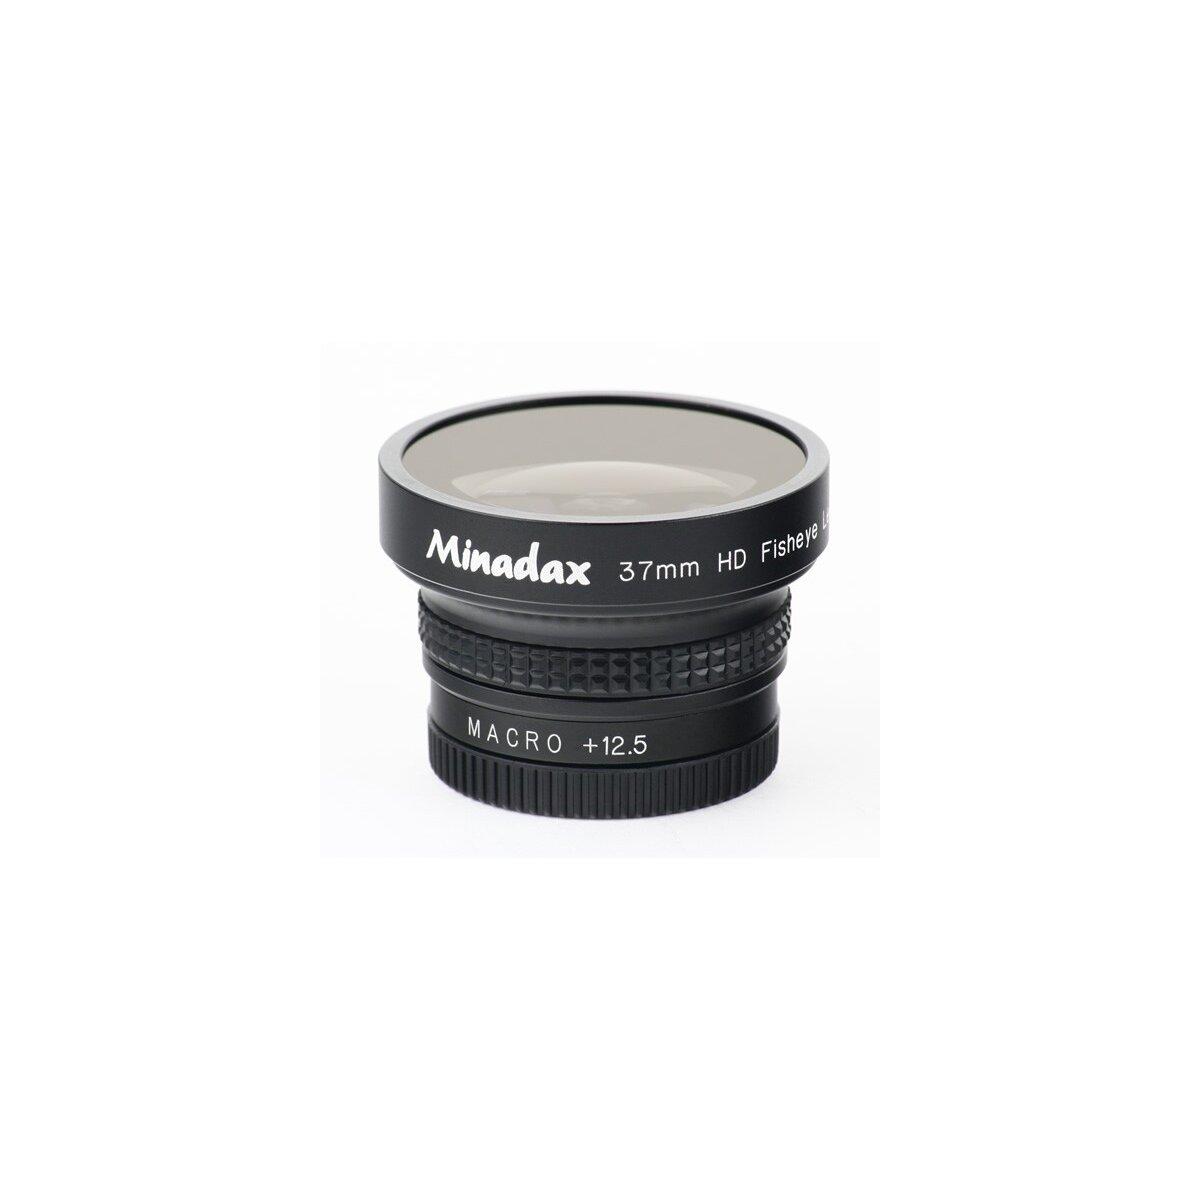 0.42x Minadax Fisheye Vorsatz kompatibel für Fujifilm FinePix E500, E510 - 37mm